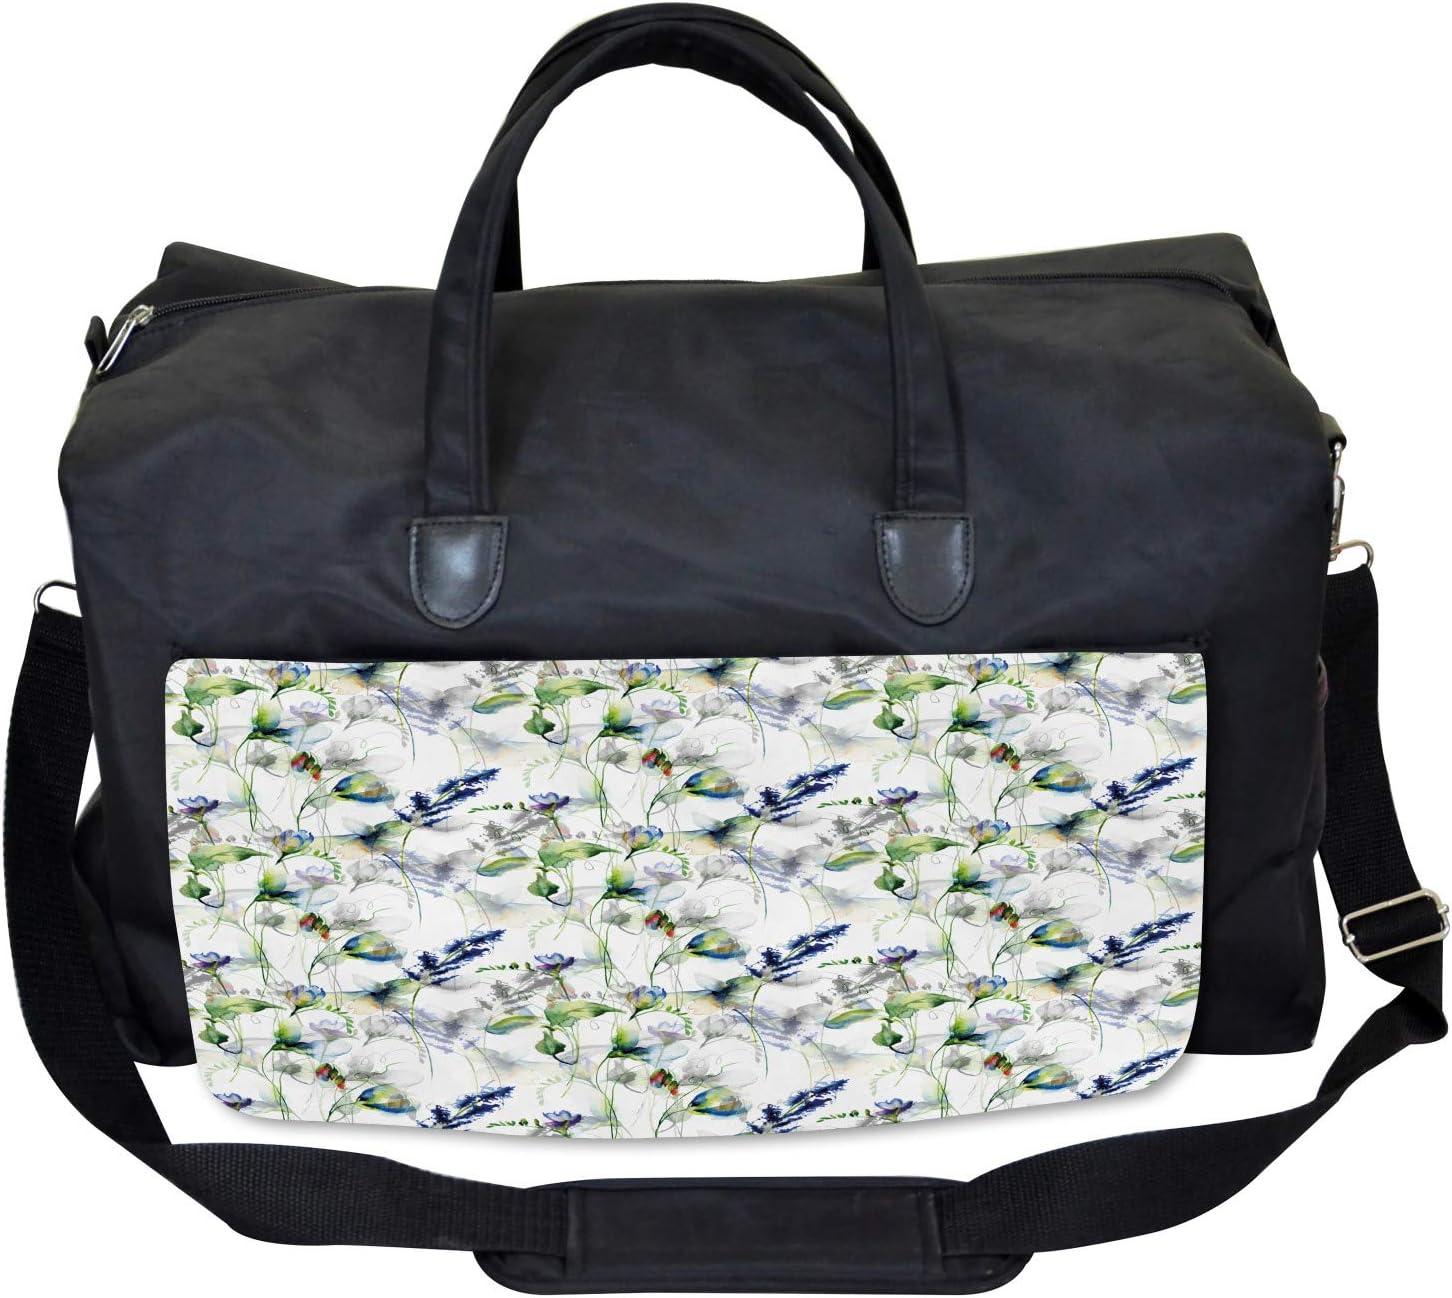 Ambesonne Floral Gym Bag Large Weekender Carry-on Sweet Pea Blossom Design